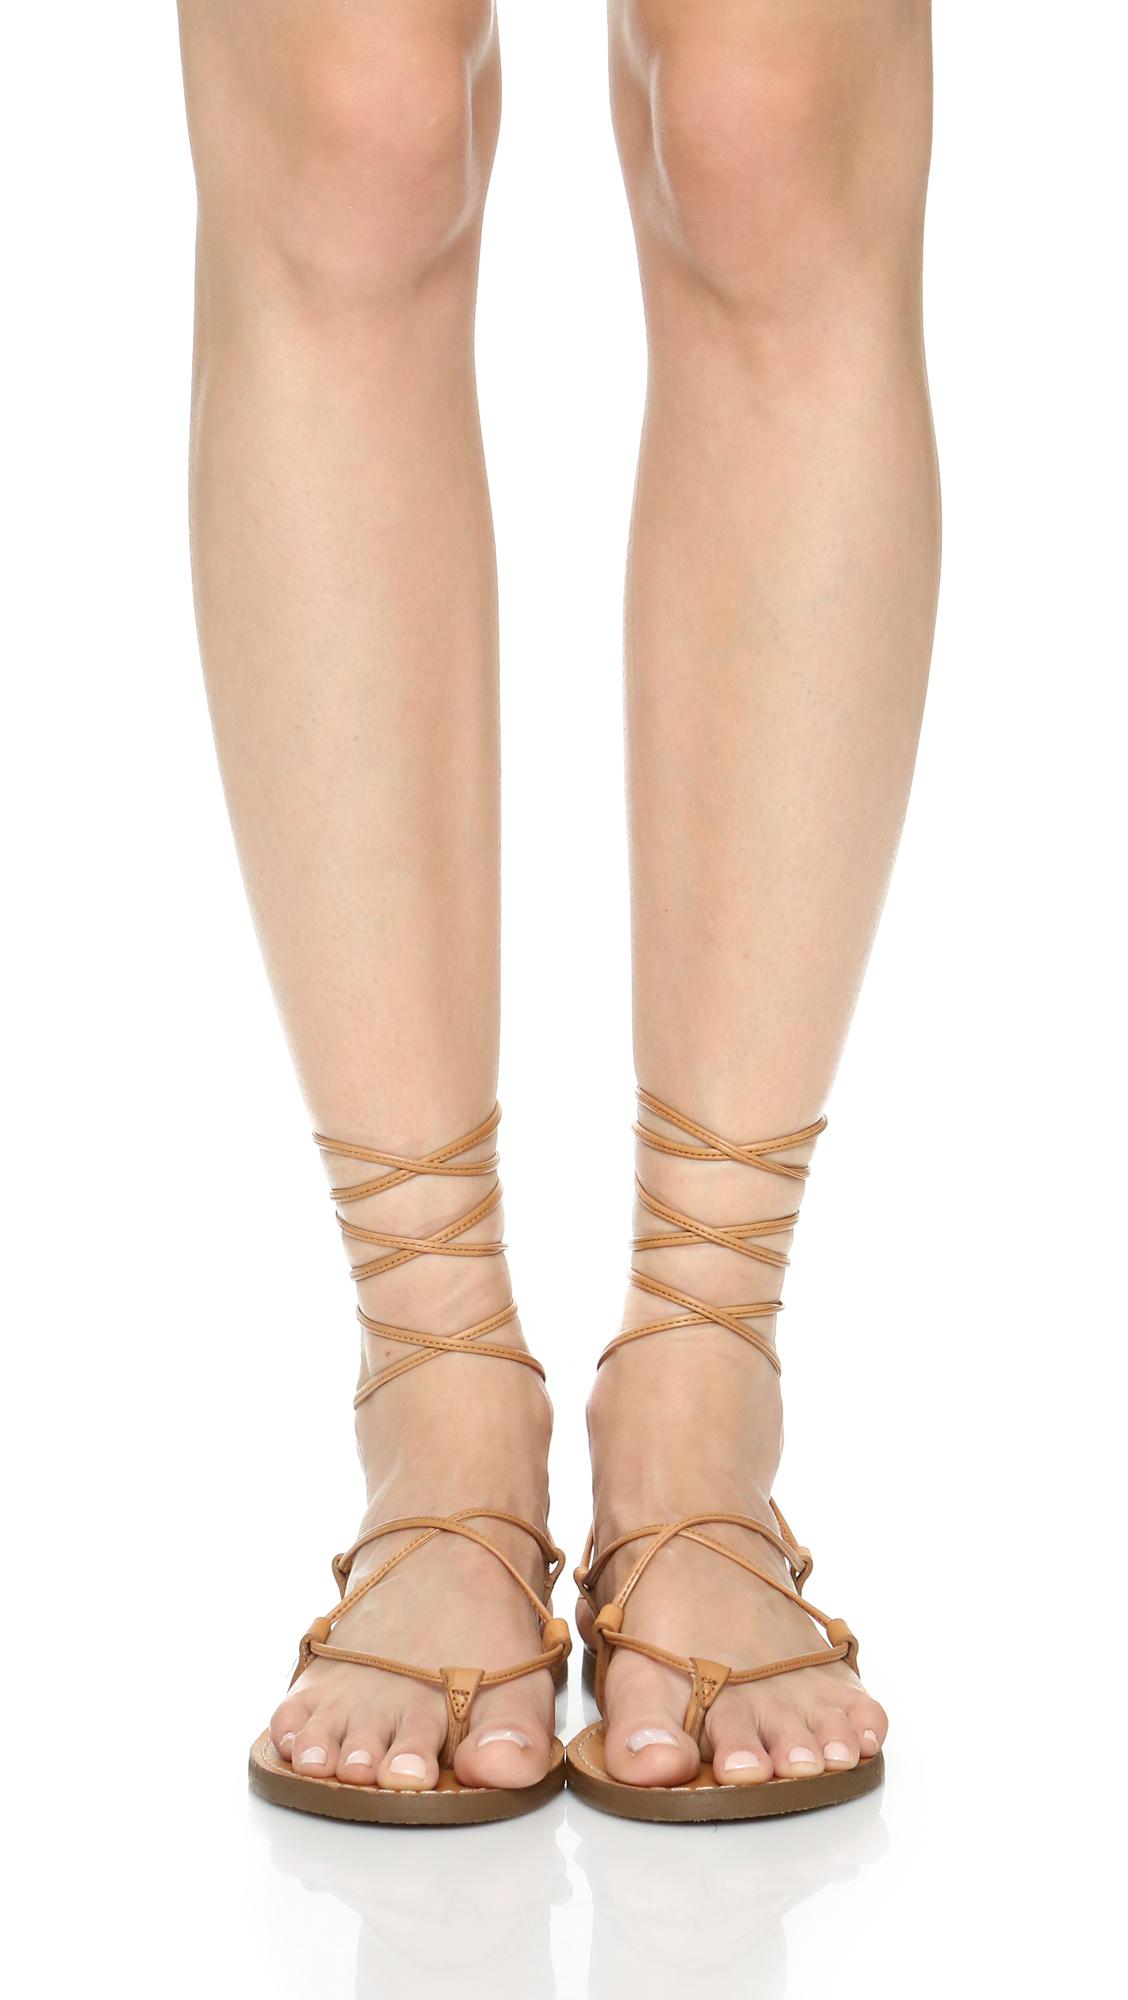 156e67f05794 Madewell Kana Lace Up Gladiator Sandals